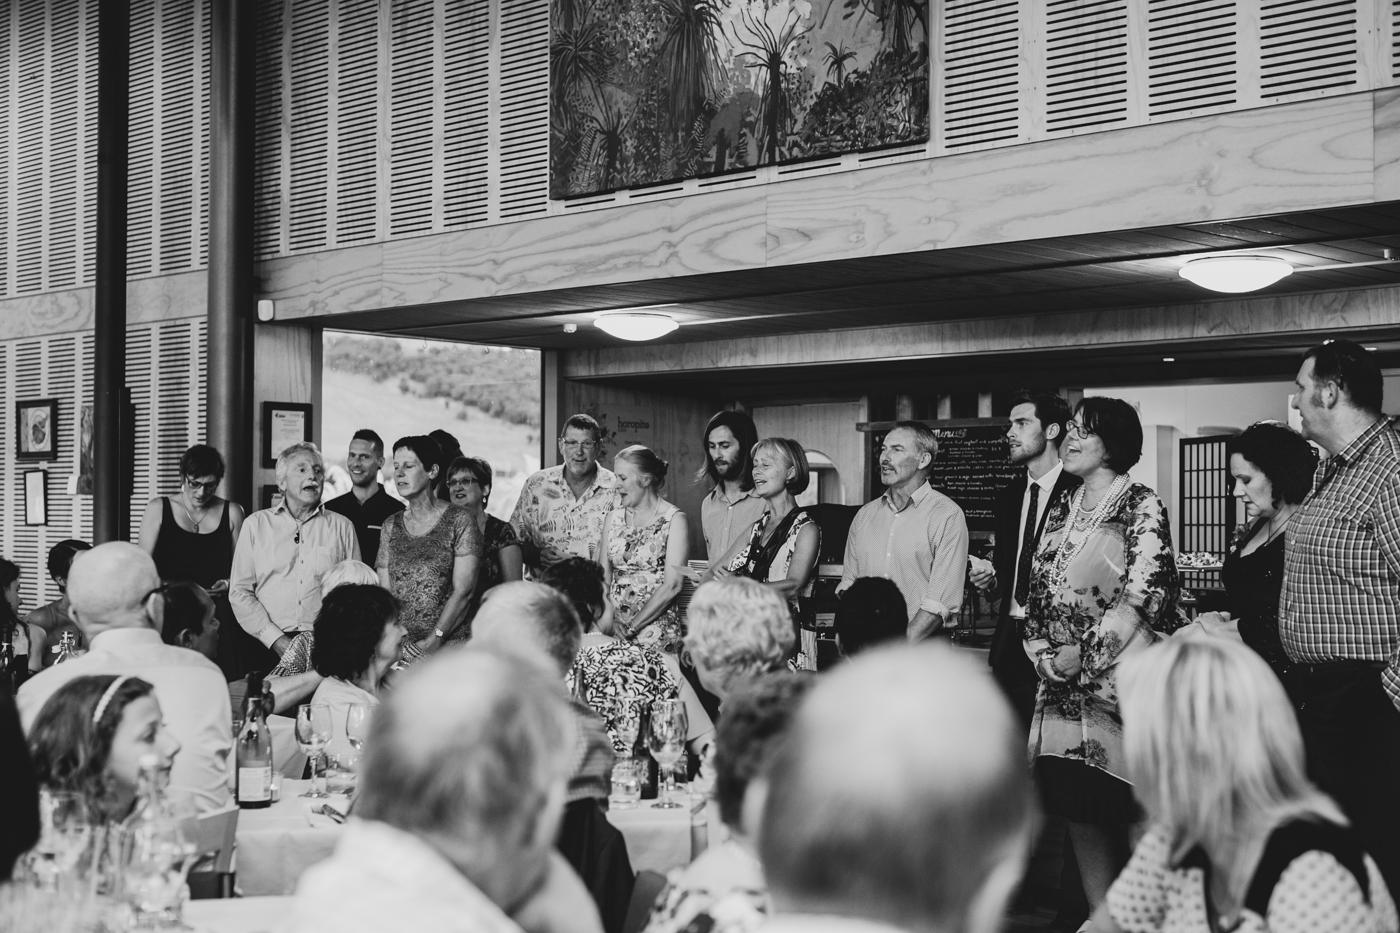 Ariana & Tim - Dunedin, New Zealand Wedding - Destination Wedding - Samantha Heather Photography-244.jpg